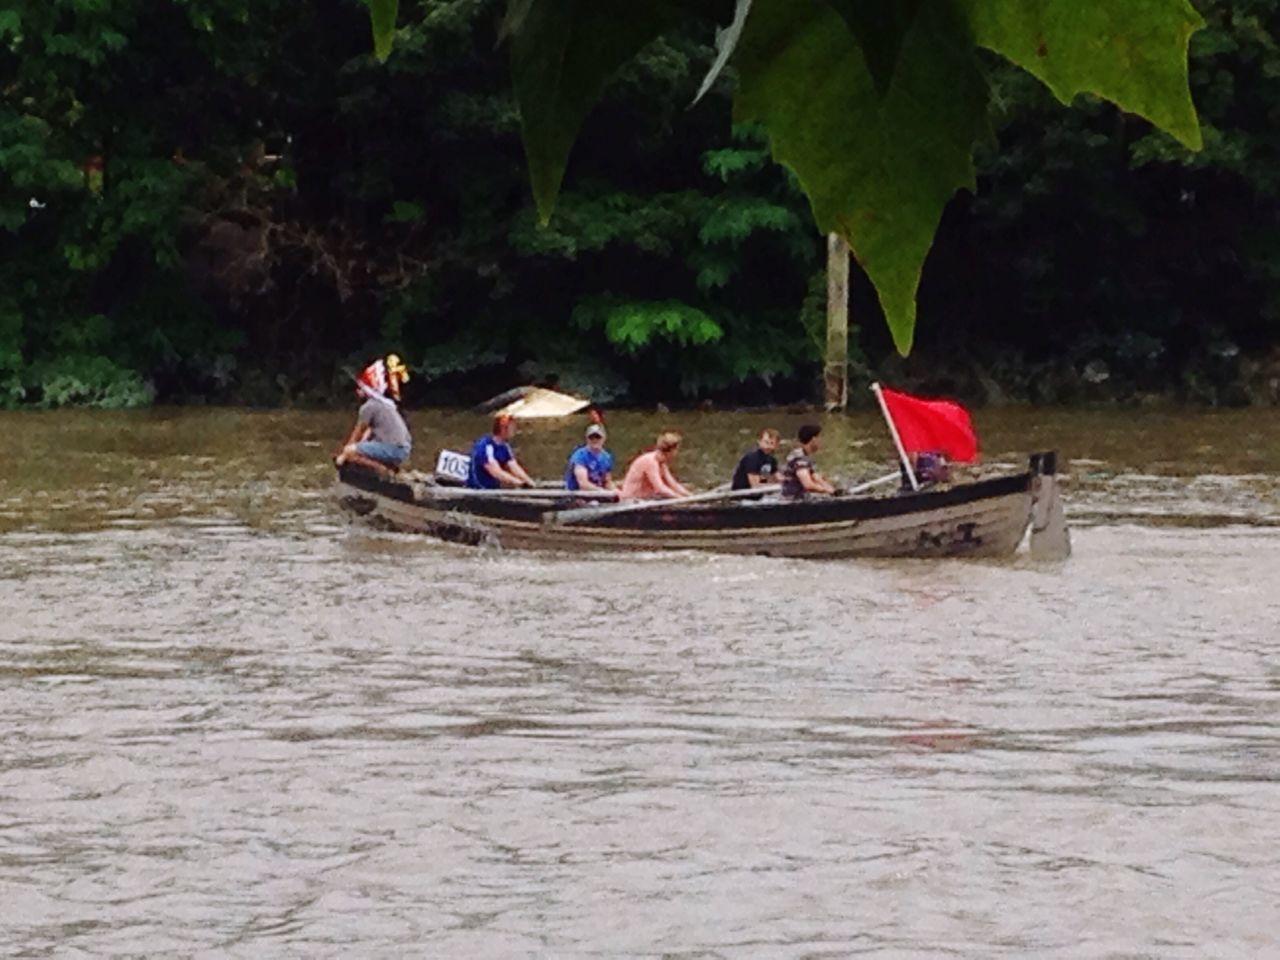 Enable This Week On Eyeem Nautical Vessel Row Lifestyles Leisure Activity Boating Transportation Photooftheday